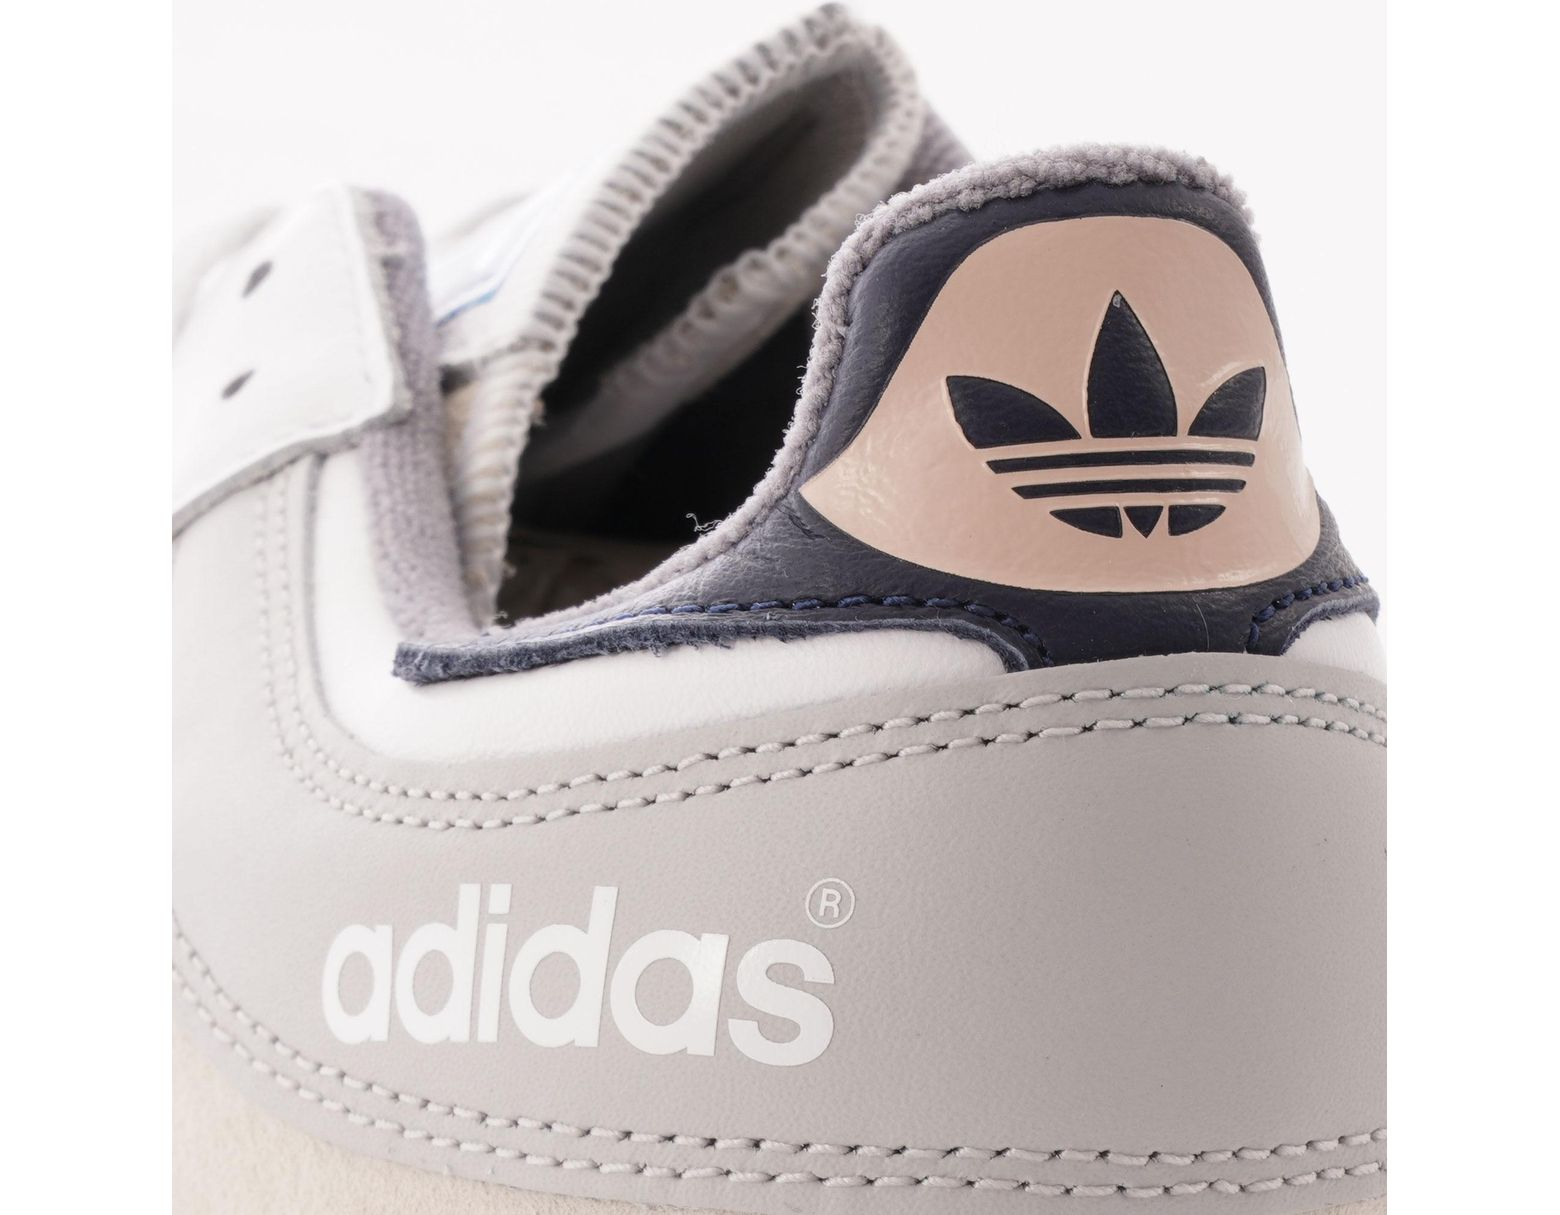 Adidas Originals Handball Top | Raw White, Collegiate Navy